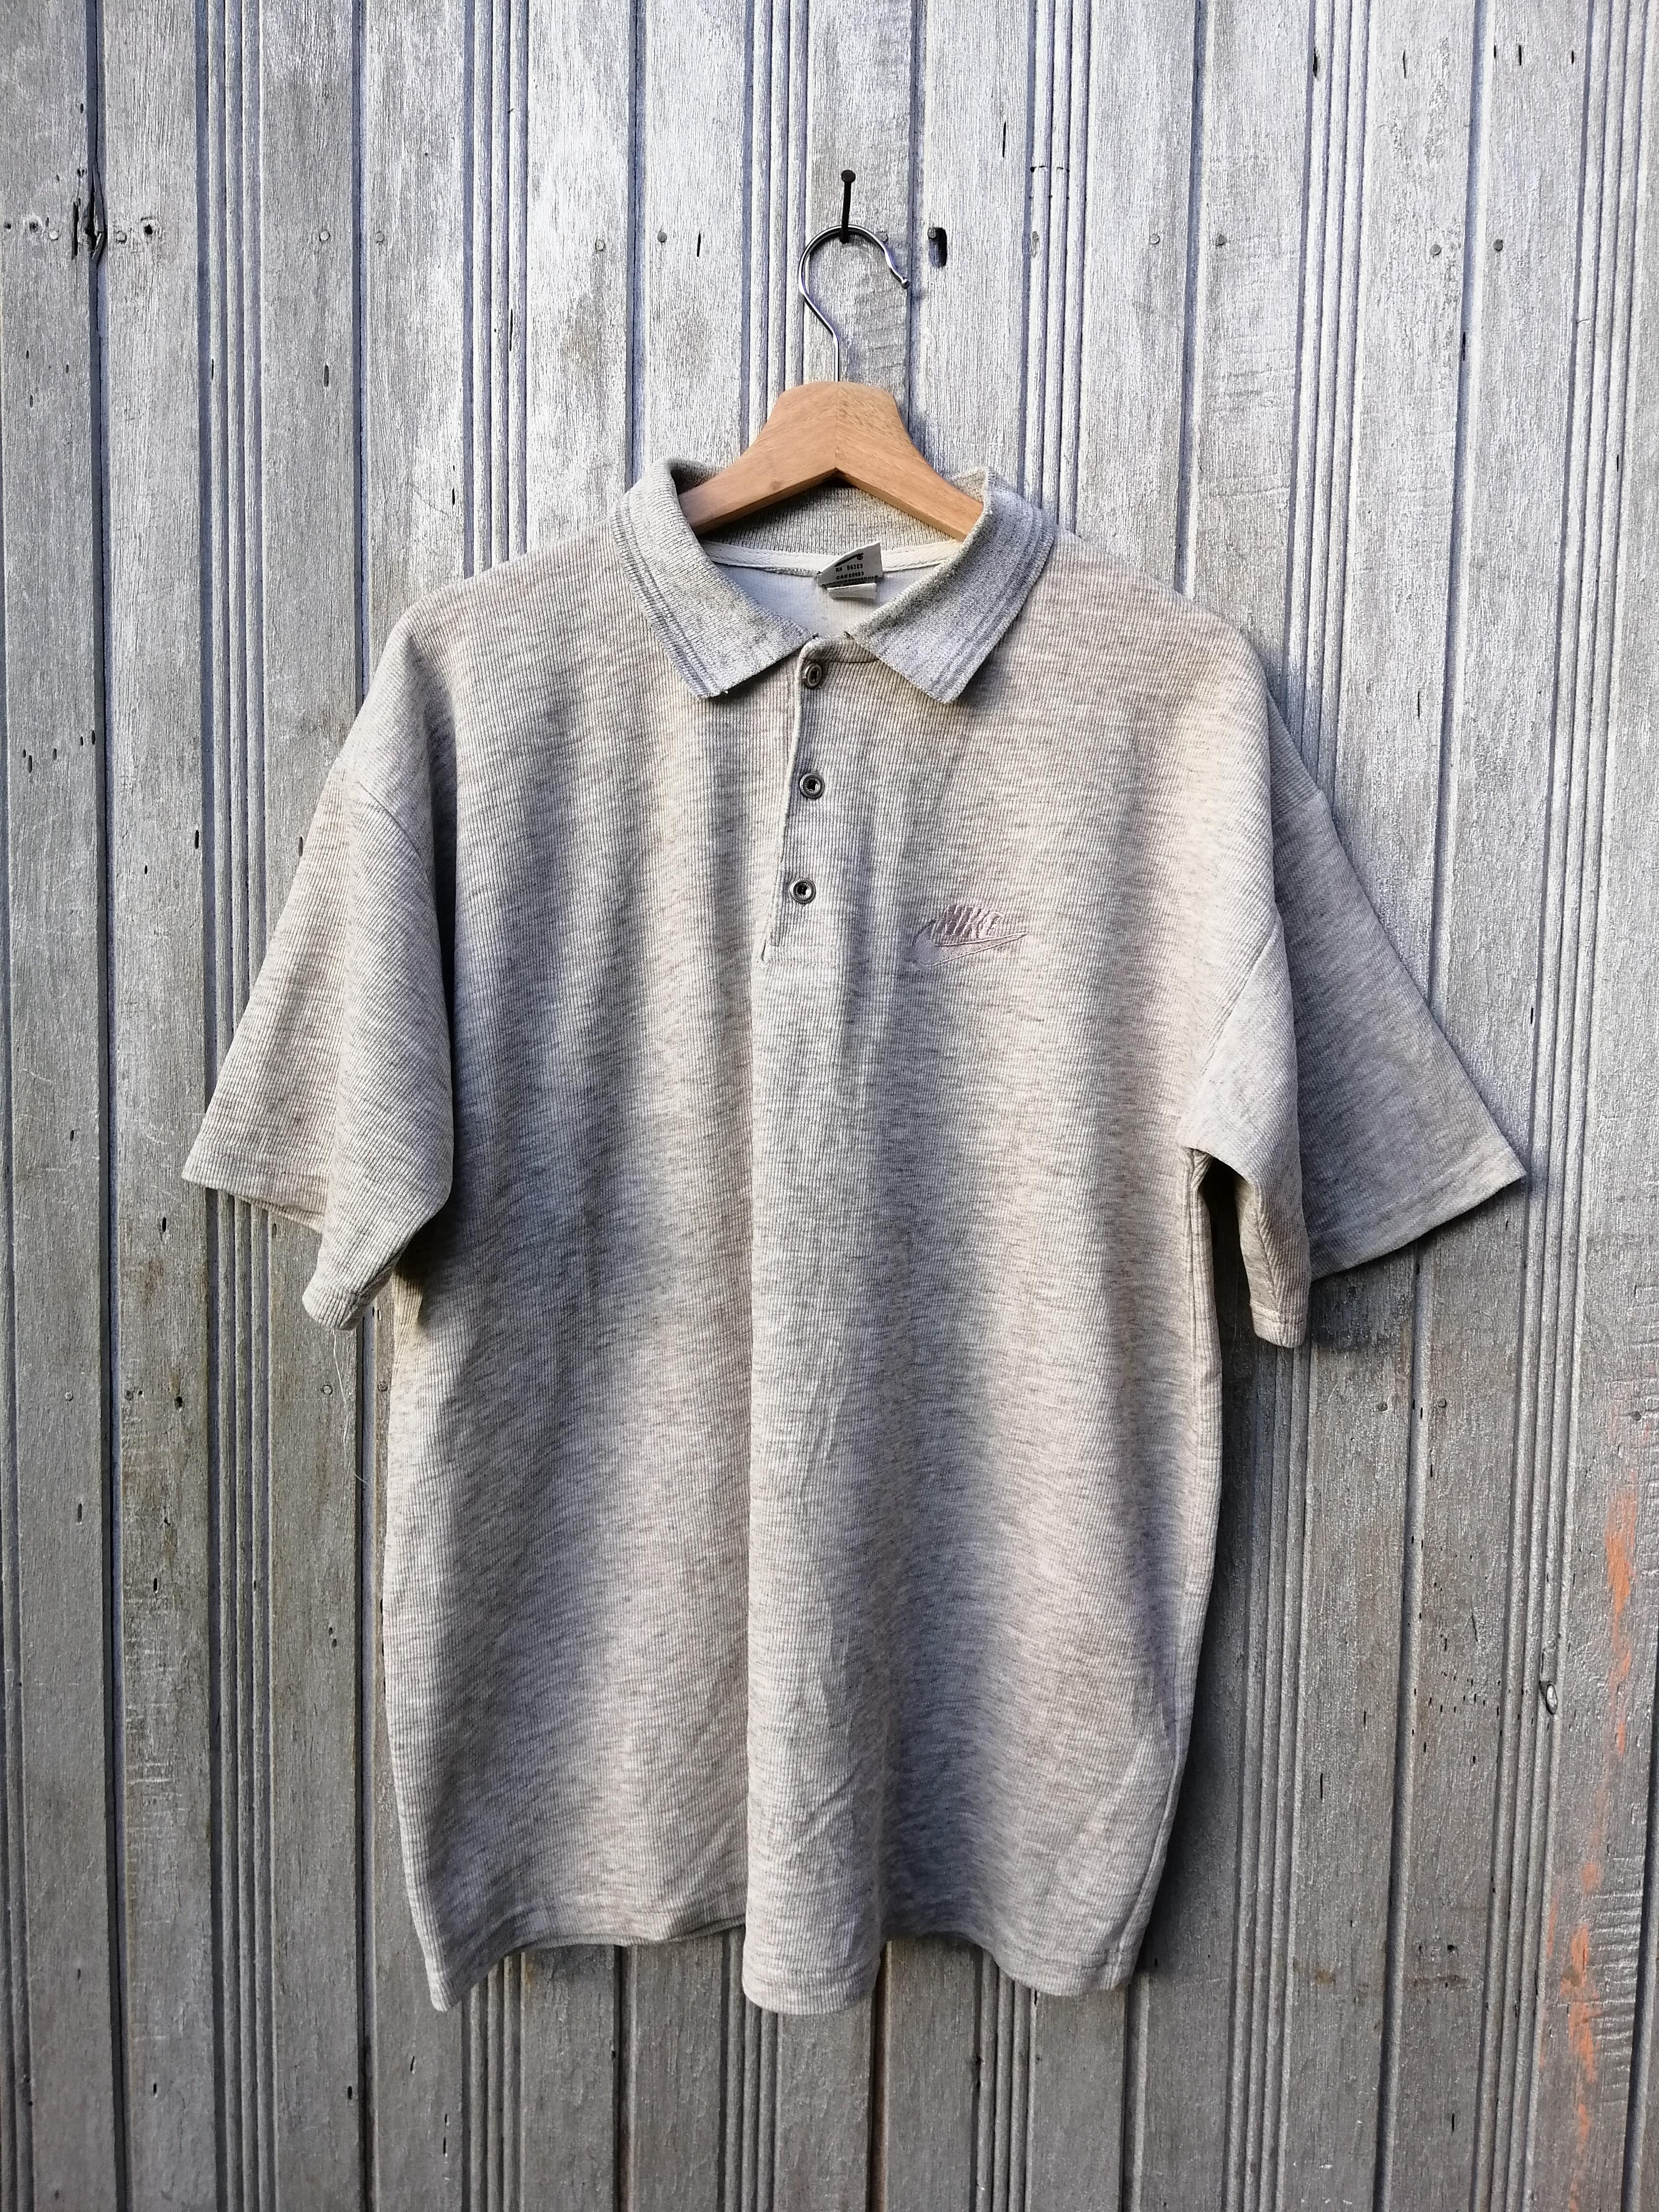 47e76ad3 Nike Retro Polo Shirt | Top Mode Depot